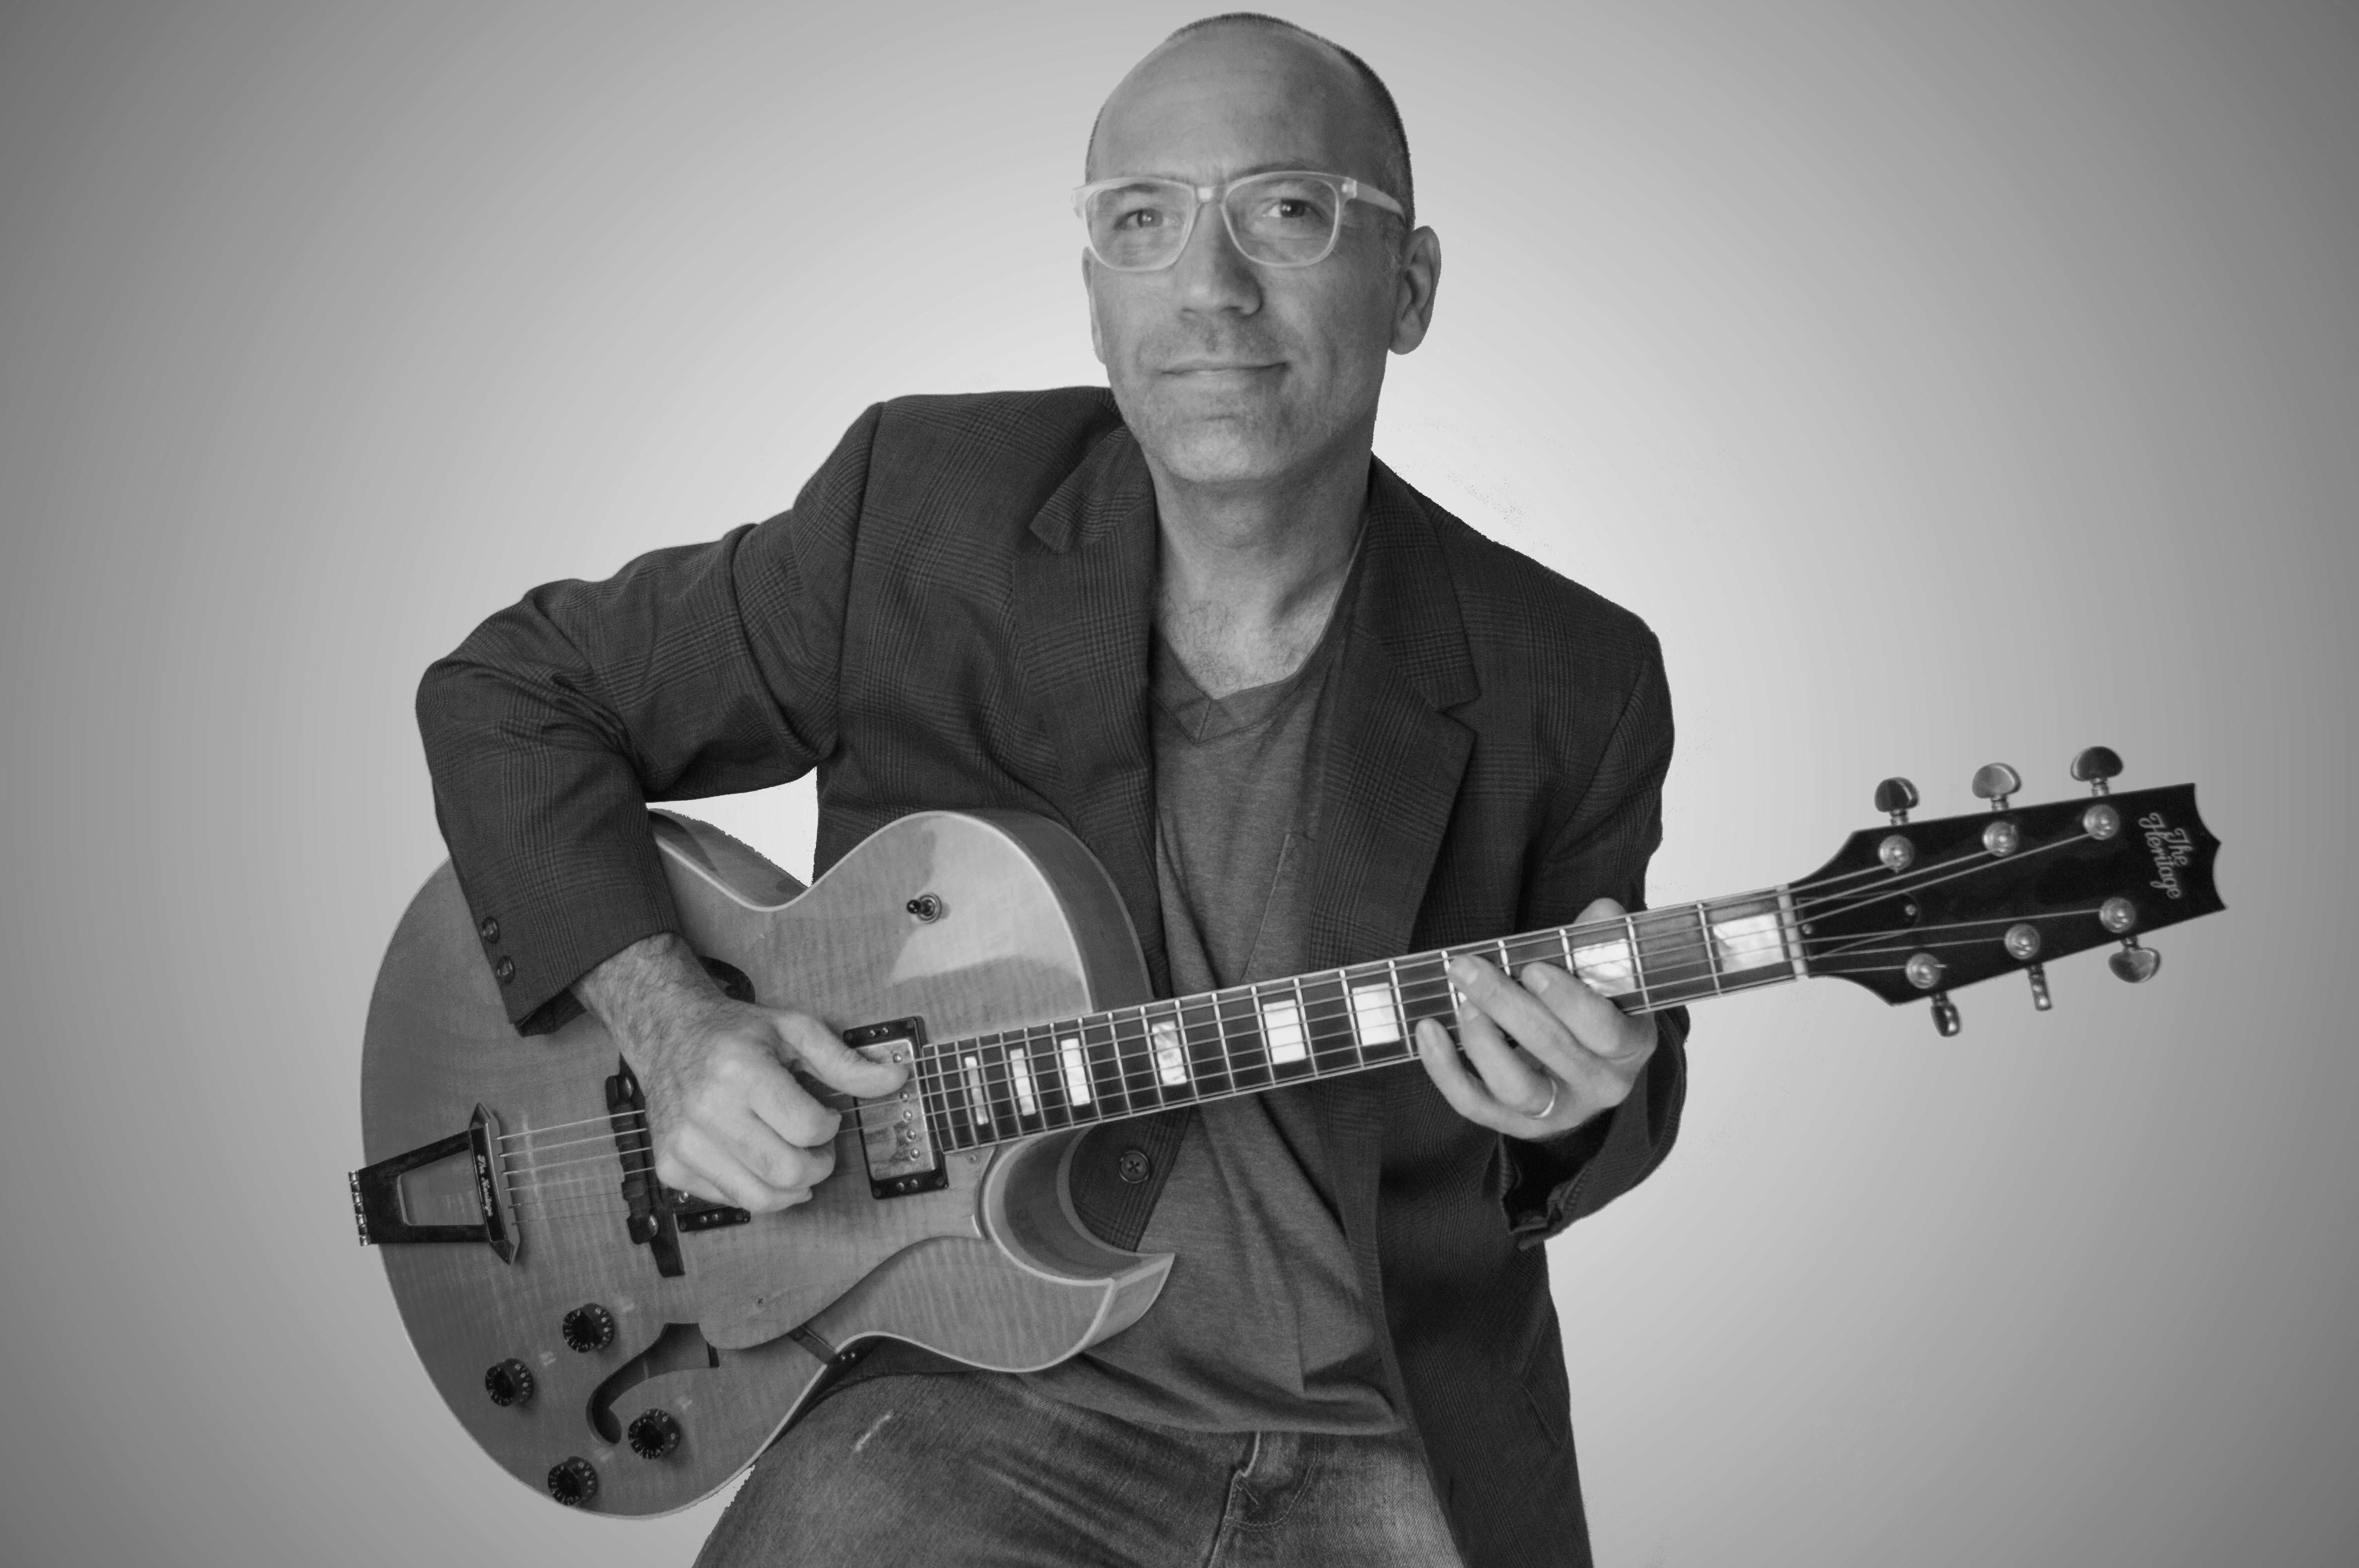 Paul Garceau - Guitarist - Producer - Instructor